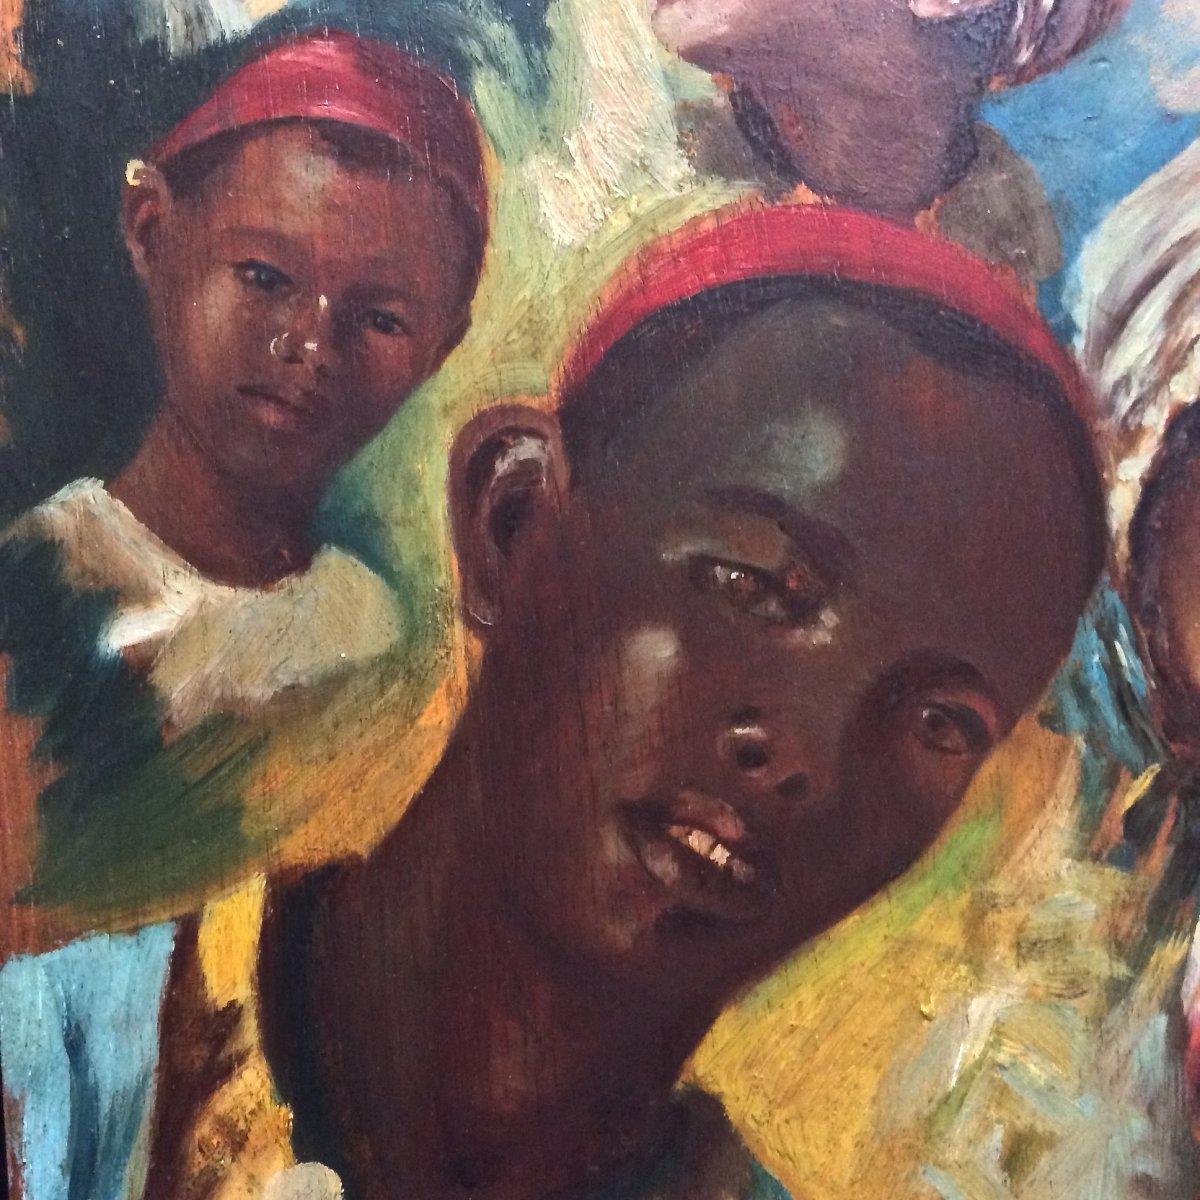 Children's Faces Painted On Palette By J. Doris. Orientalist School Of The Nineteenth.-photo-3